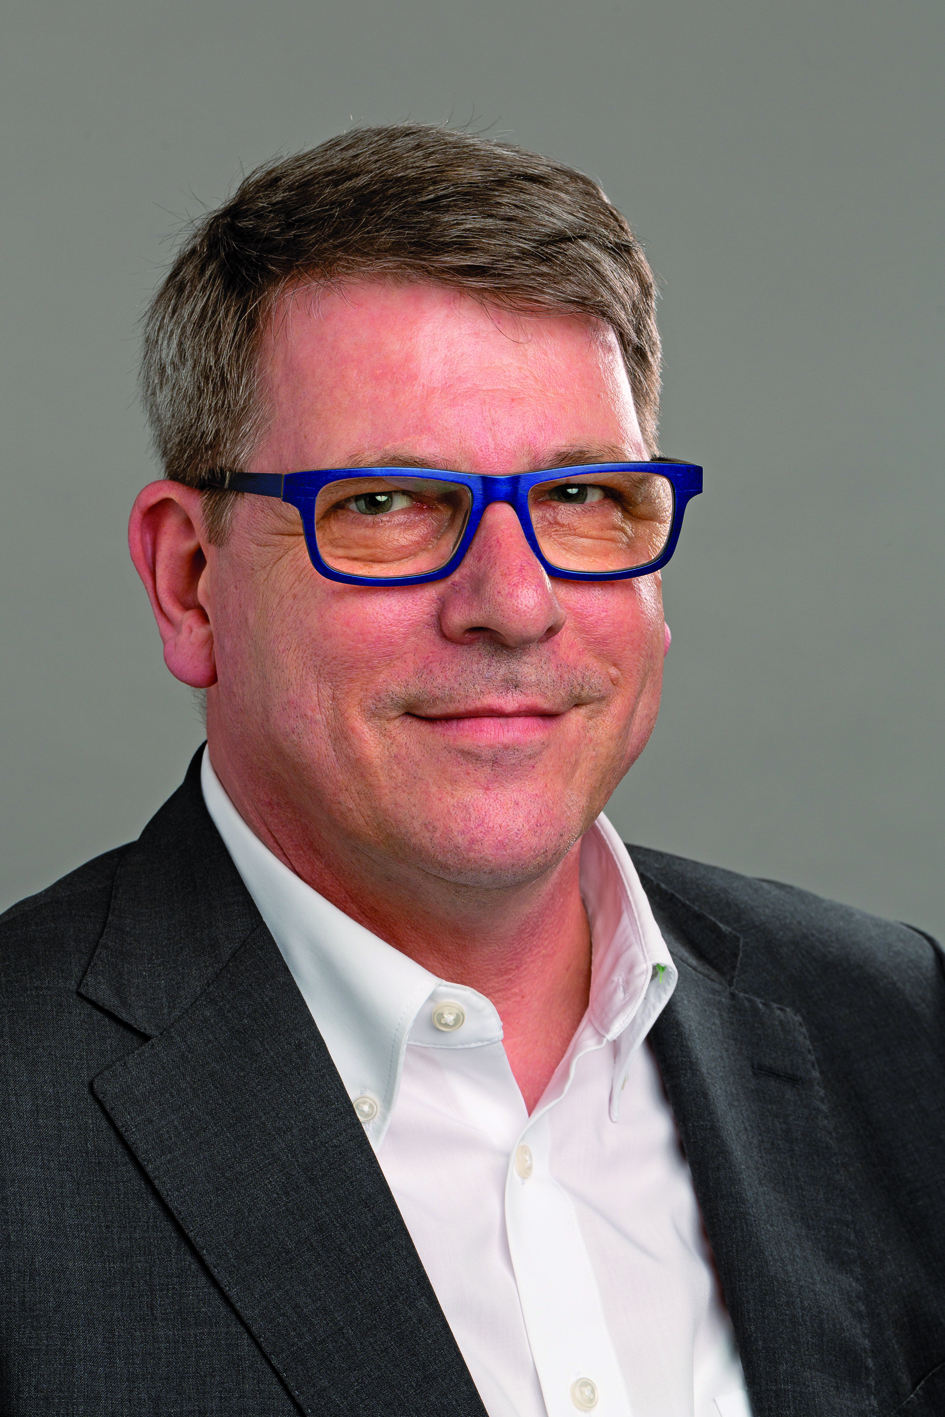 Jean-Paul Seuren ist neuer Vertriebschef bei TDM Systems